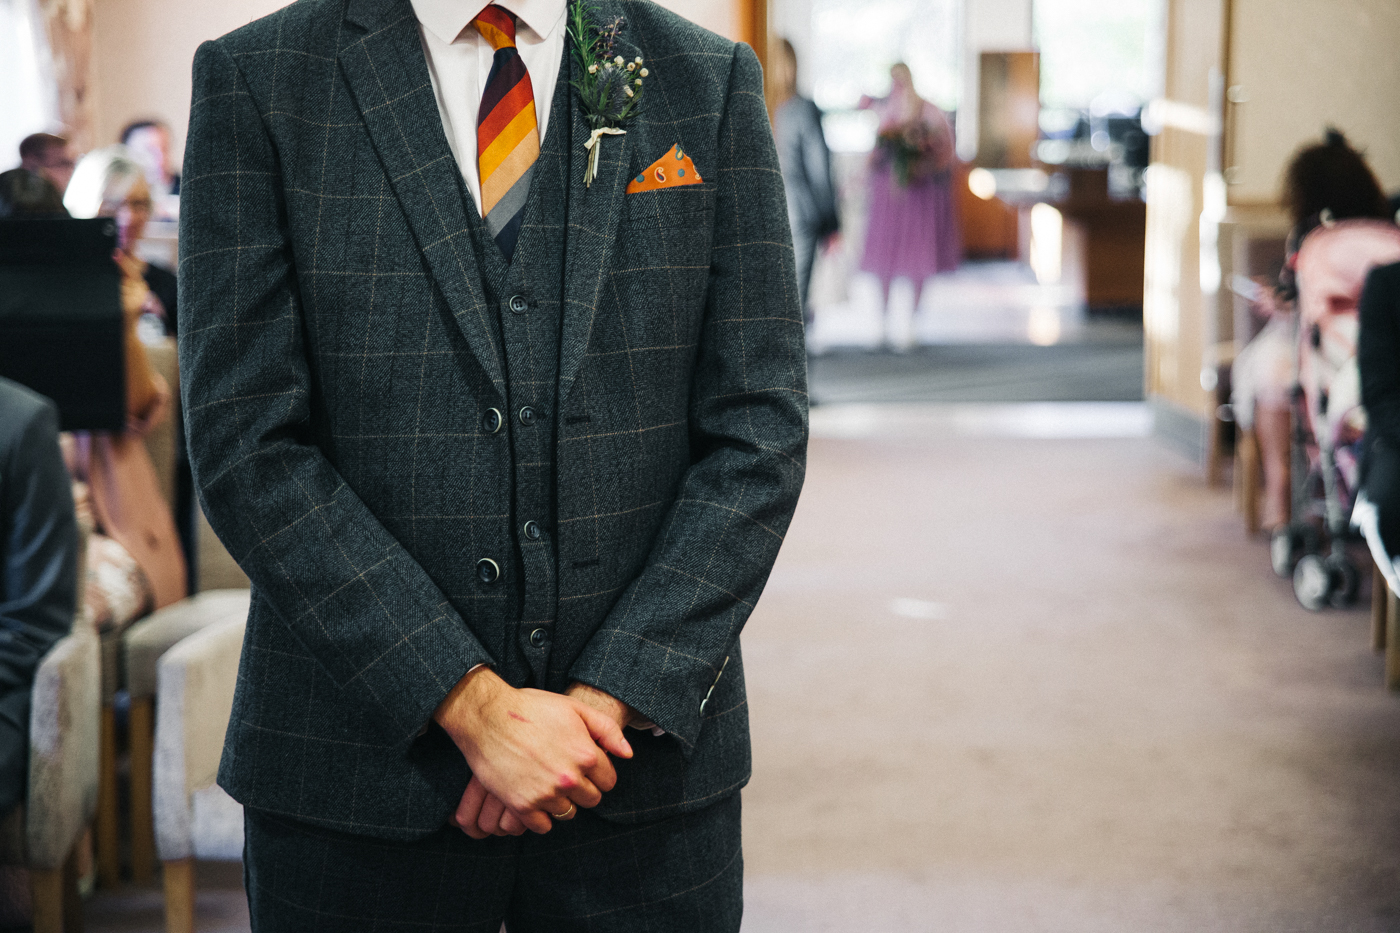 teesside-newcastle-gateshead-wedding-photography-photographer-creative-0033.jpg